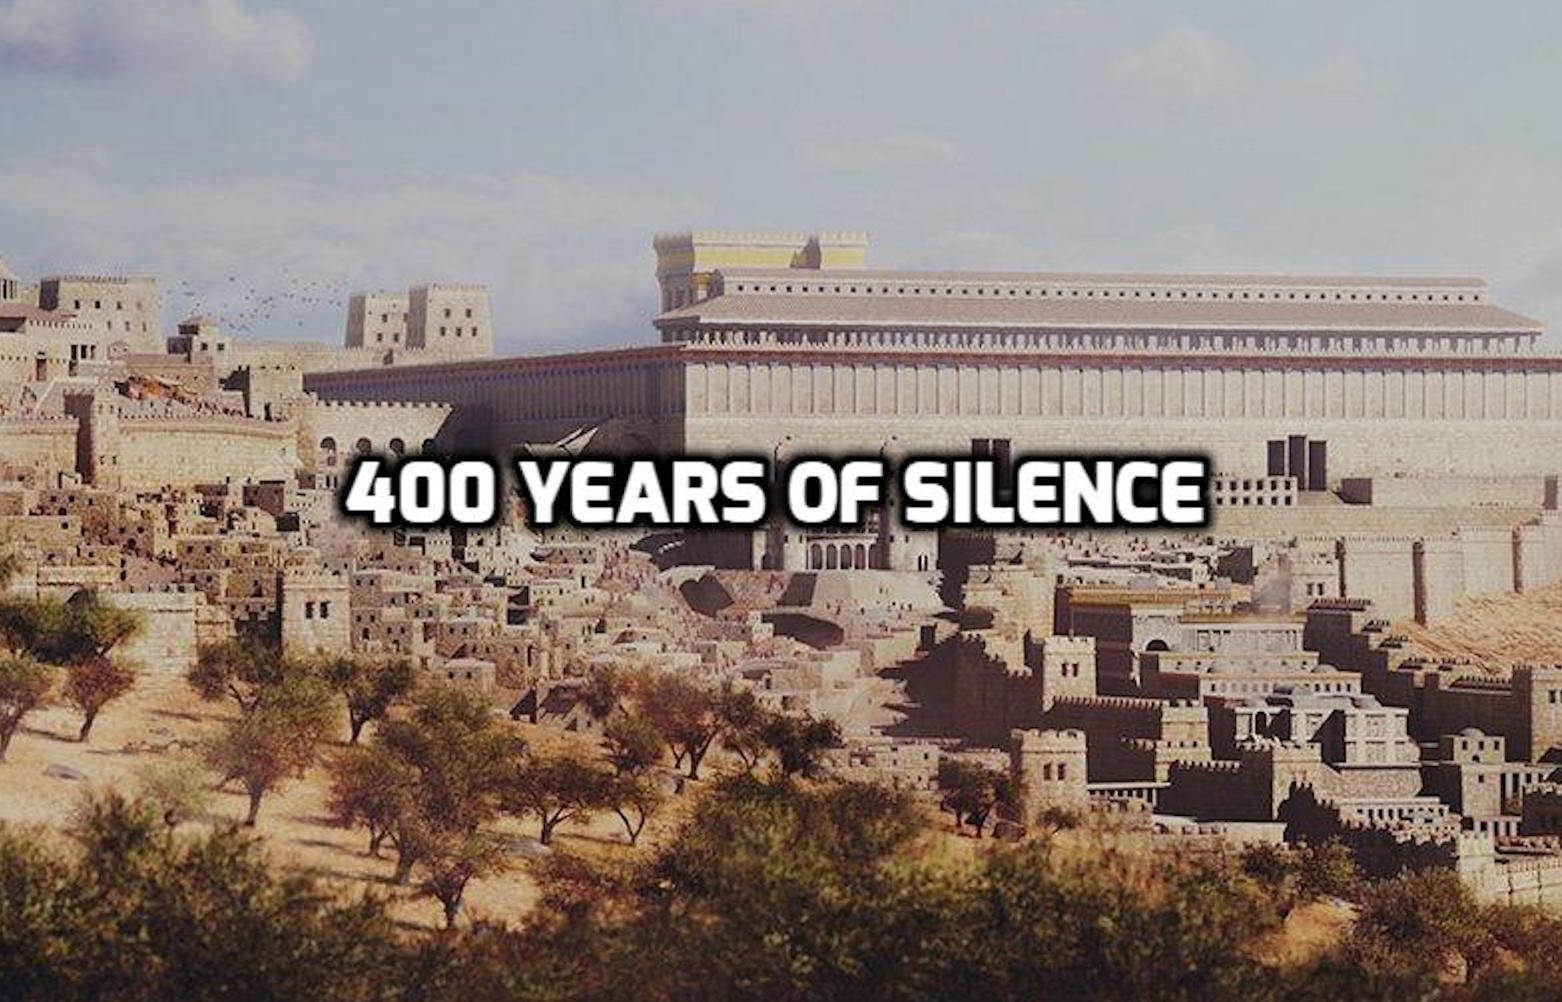 400 years between malachi and matthew